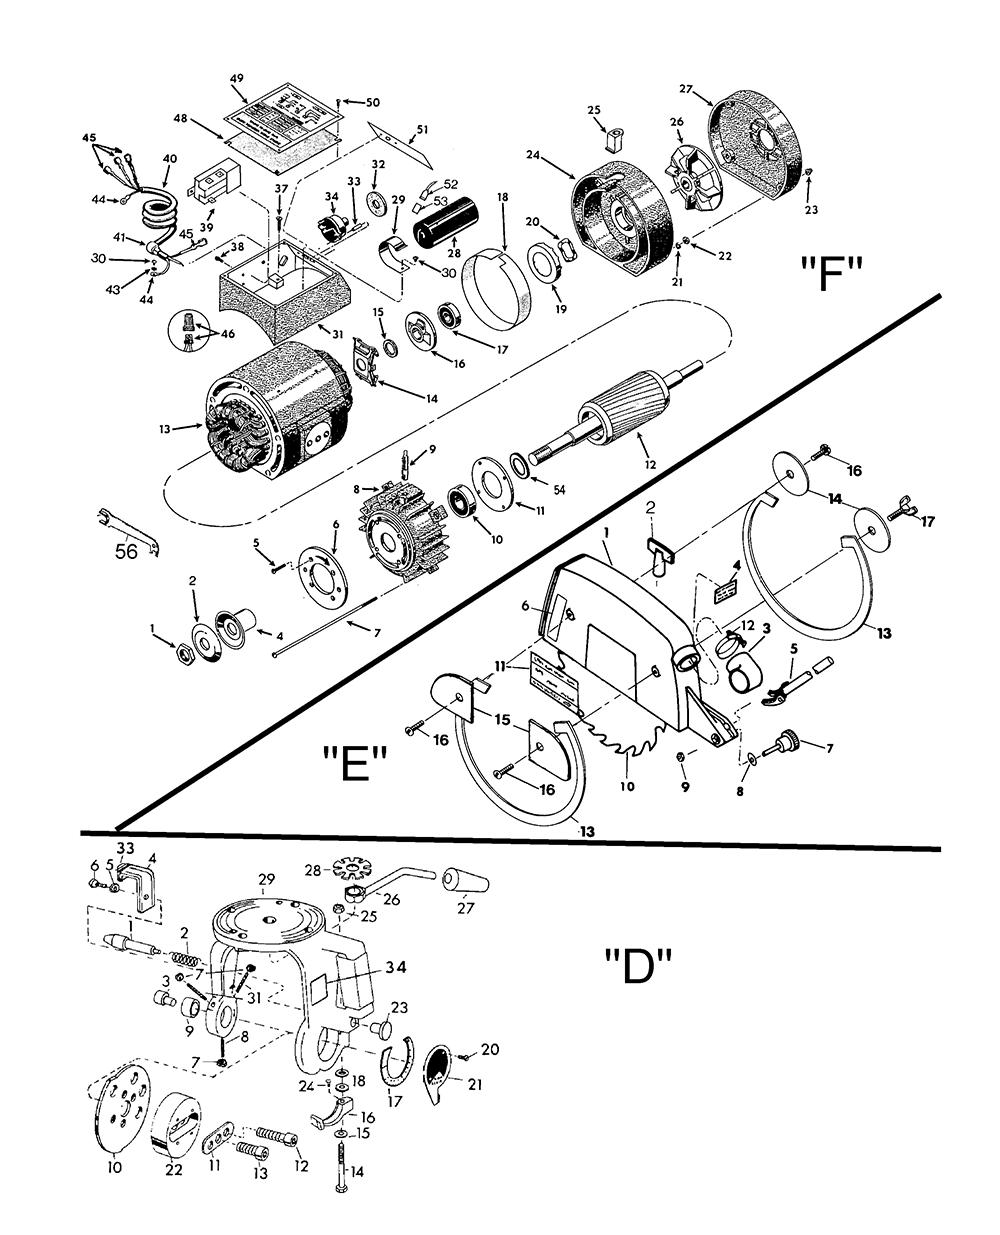 7790-BlackandDecker-T9-PB-2Break Down